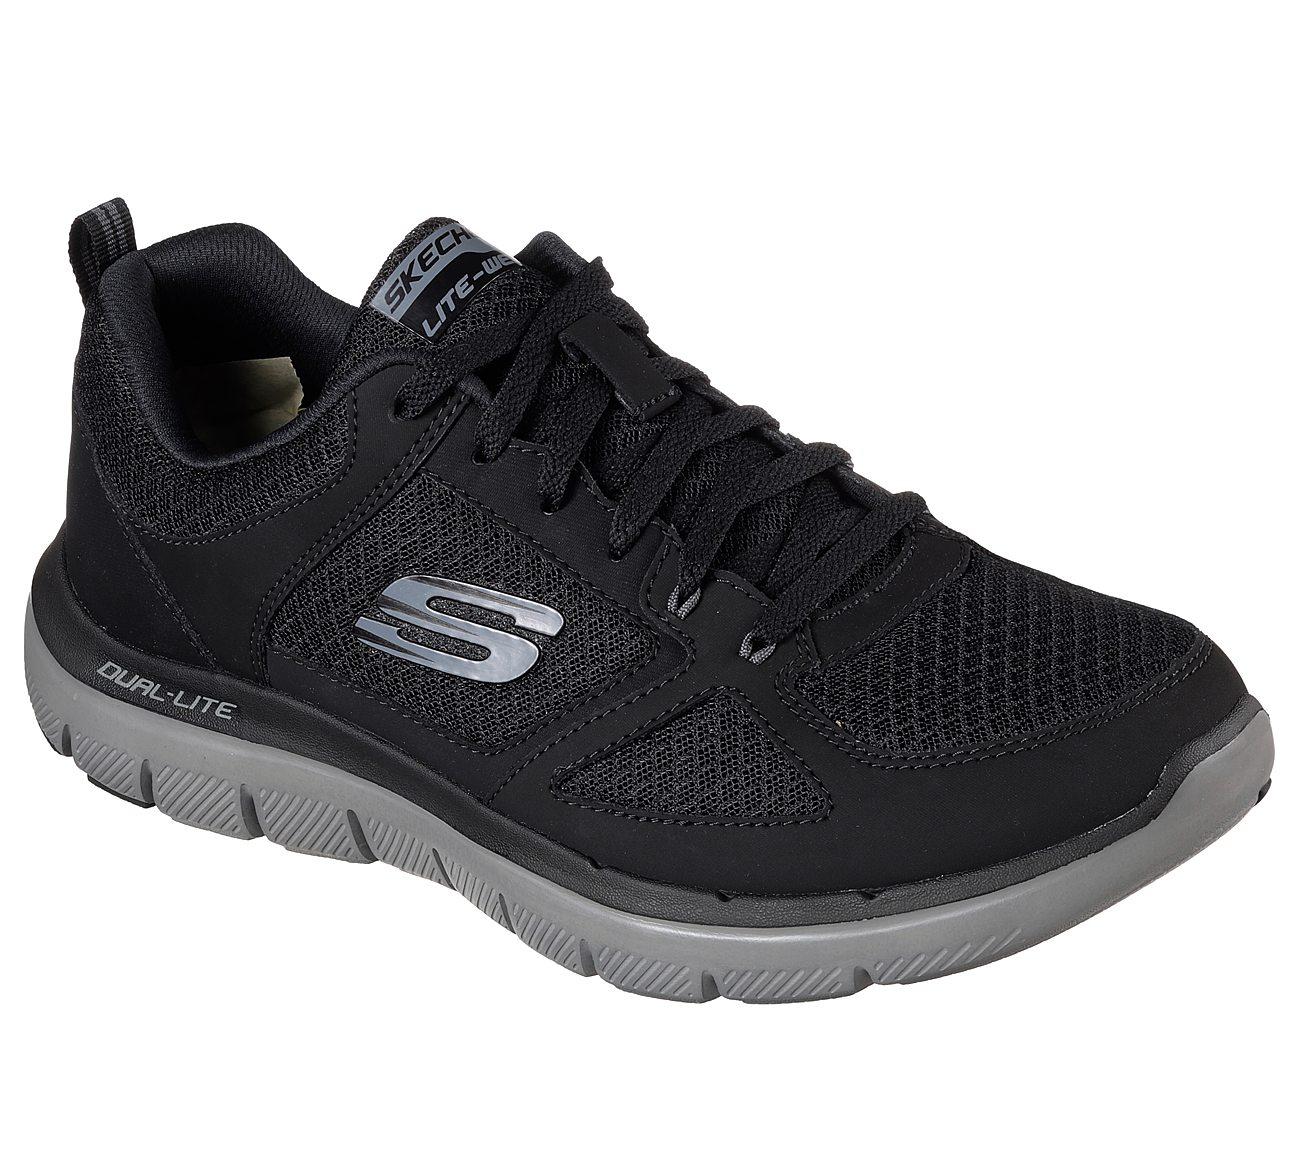 6e7dd8f9a Exclusive SKECHERS Homens shoes - SKECHERS Brasil